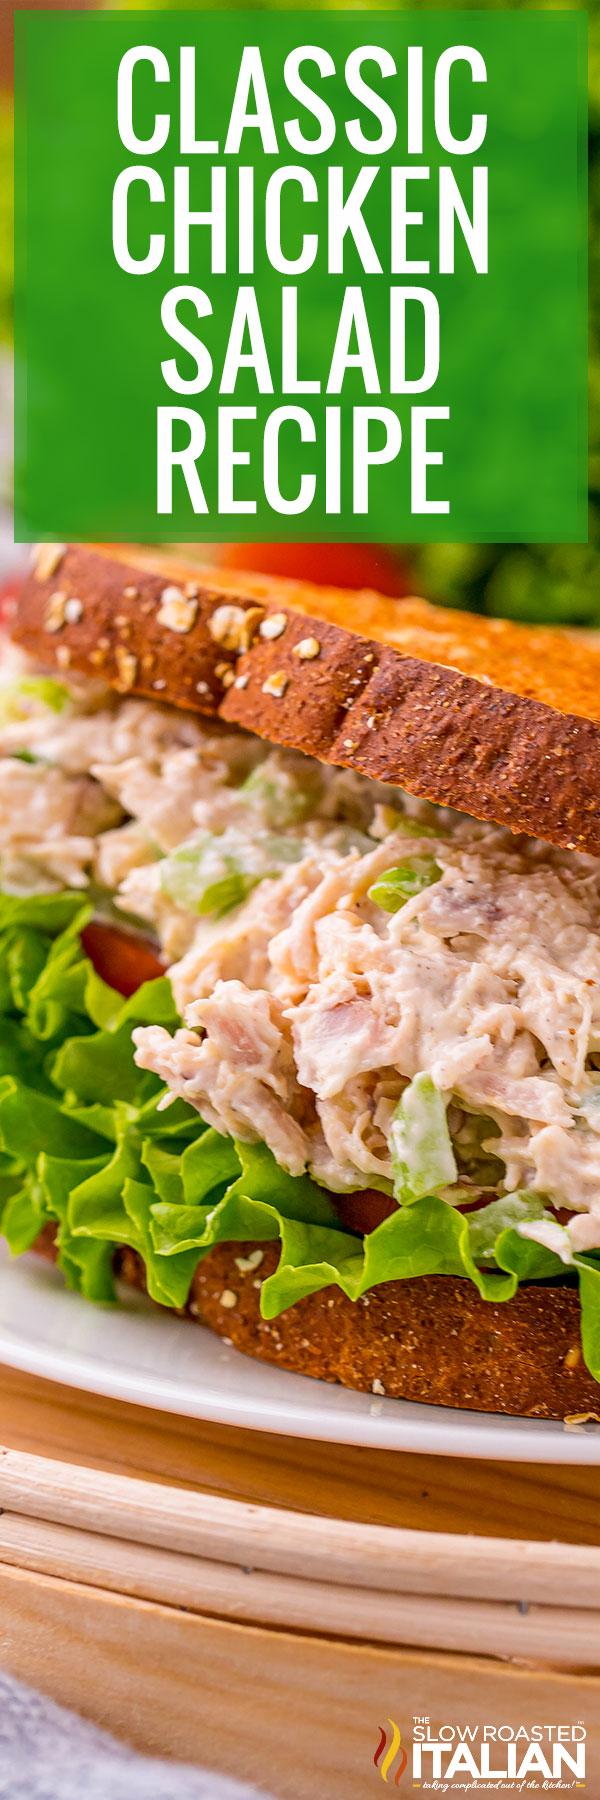 Classic Chicken Salad Recipe Closeup